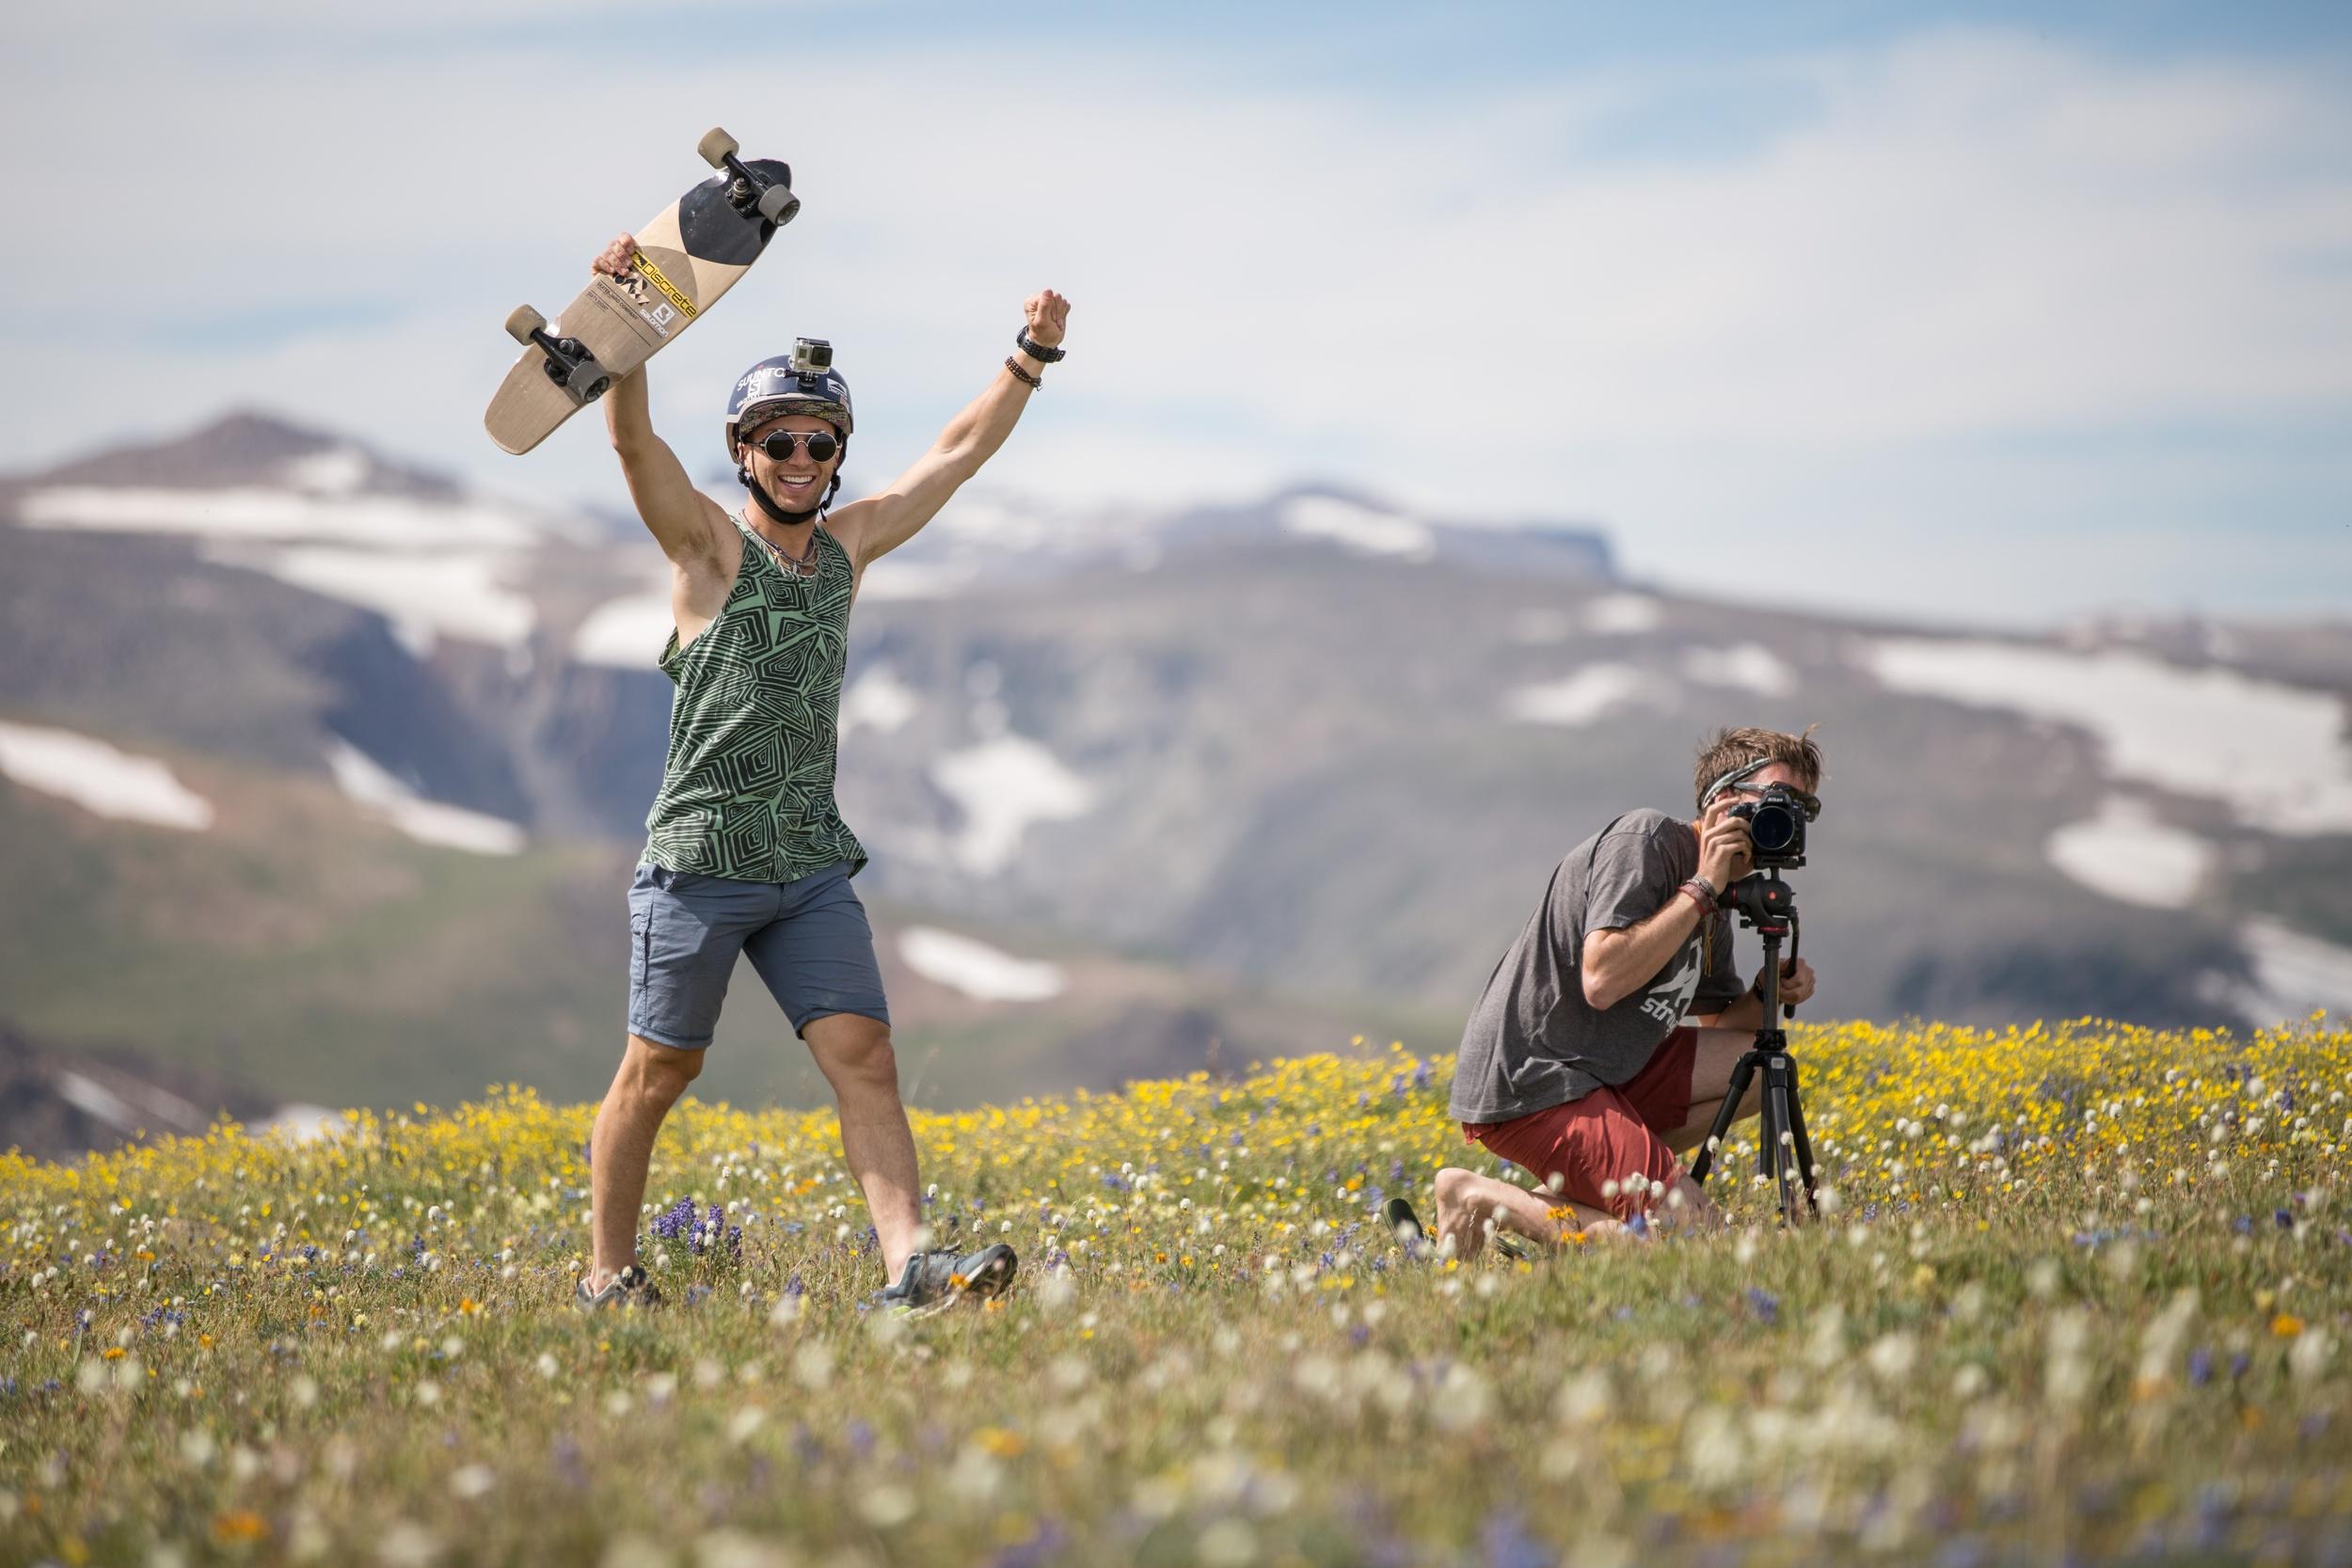 photo Graeme MacPherson  location Beartooth Pass, Montana